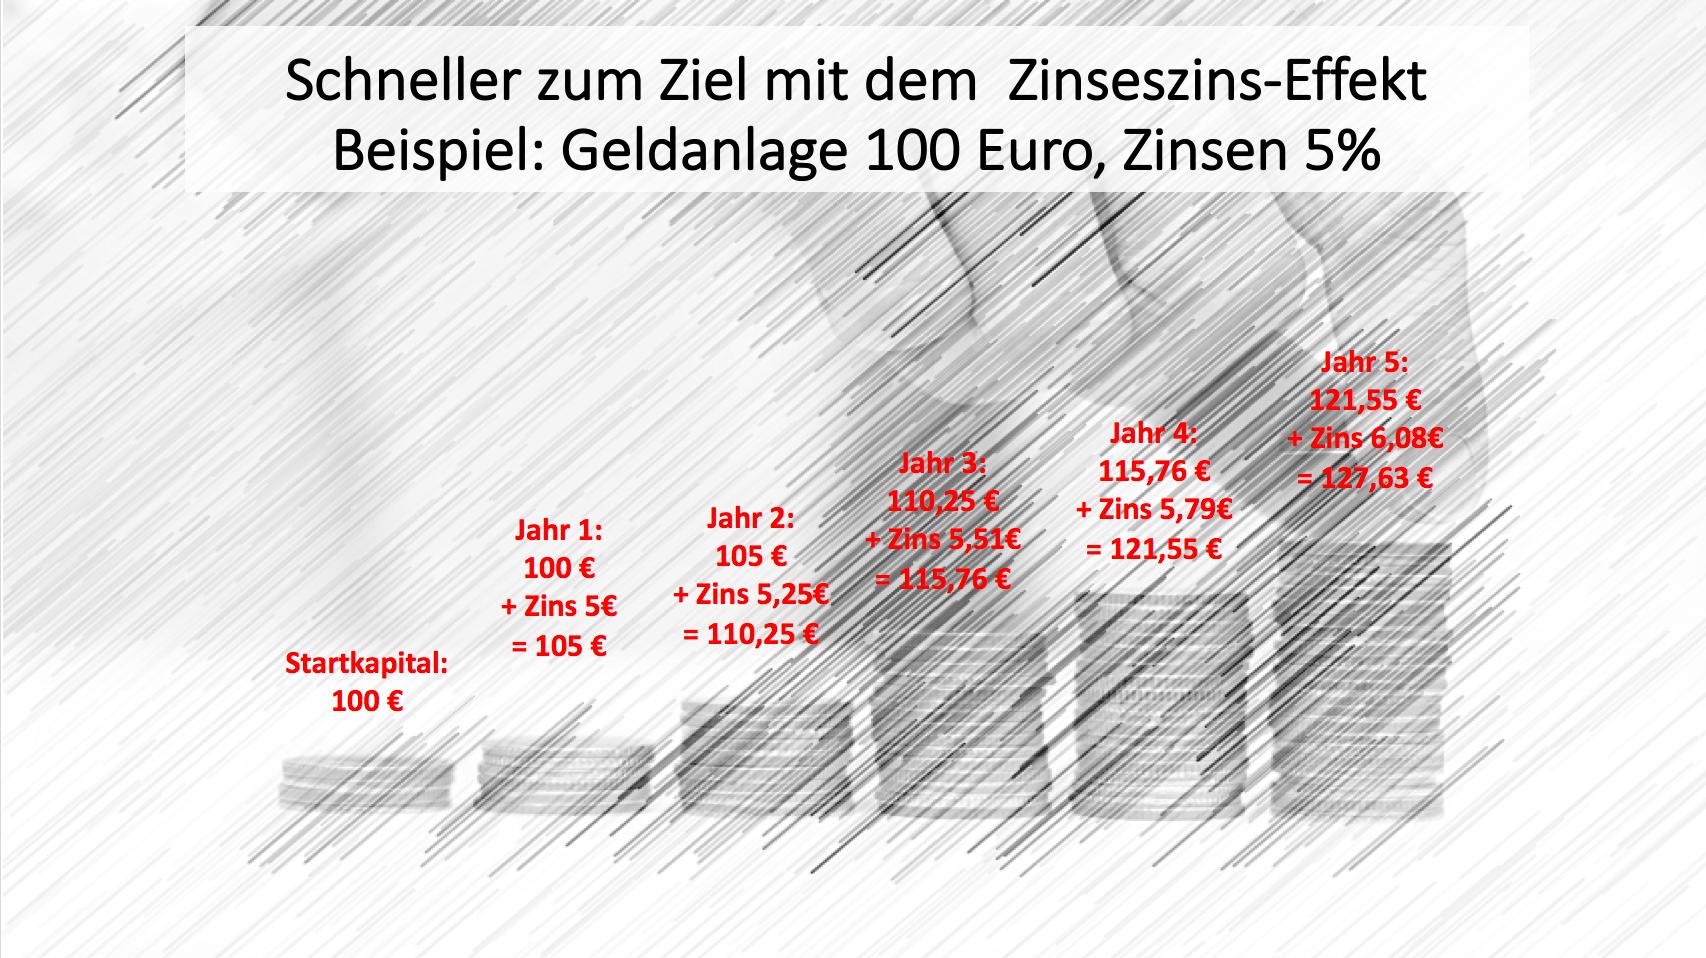 a00_zinseszins-effekt_geldstapel_neu